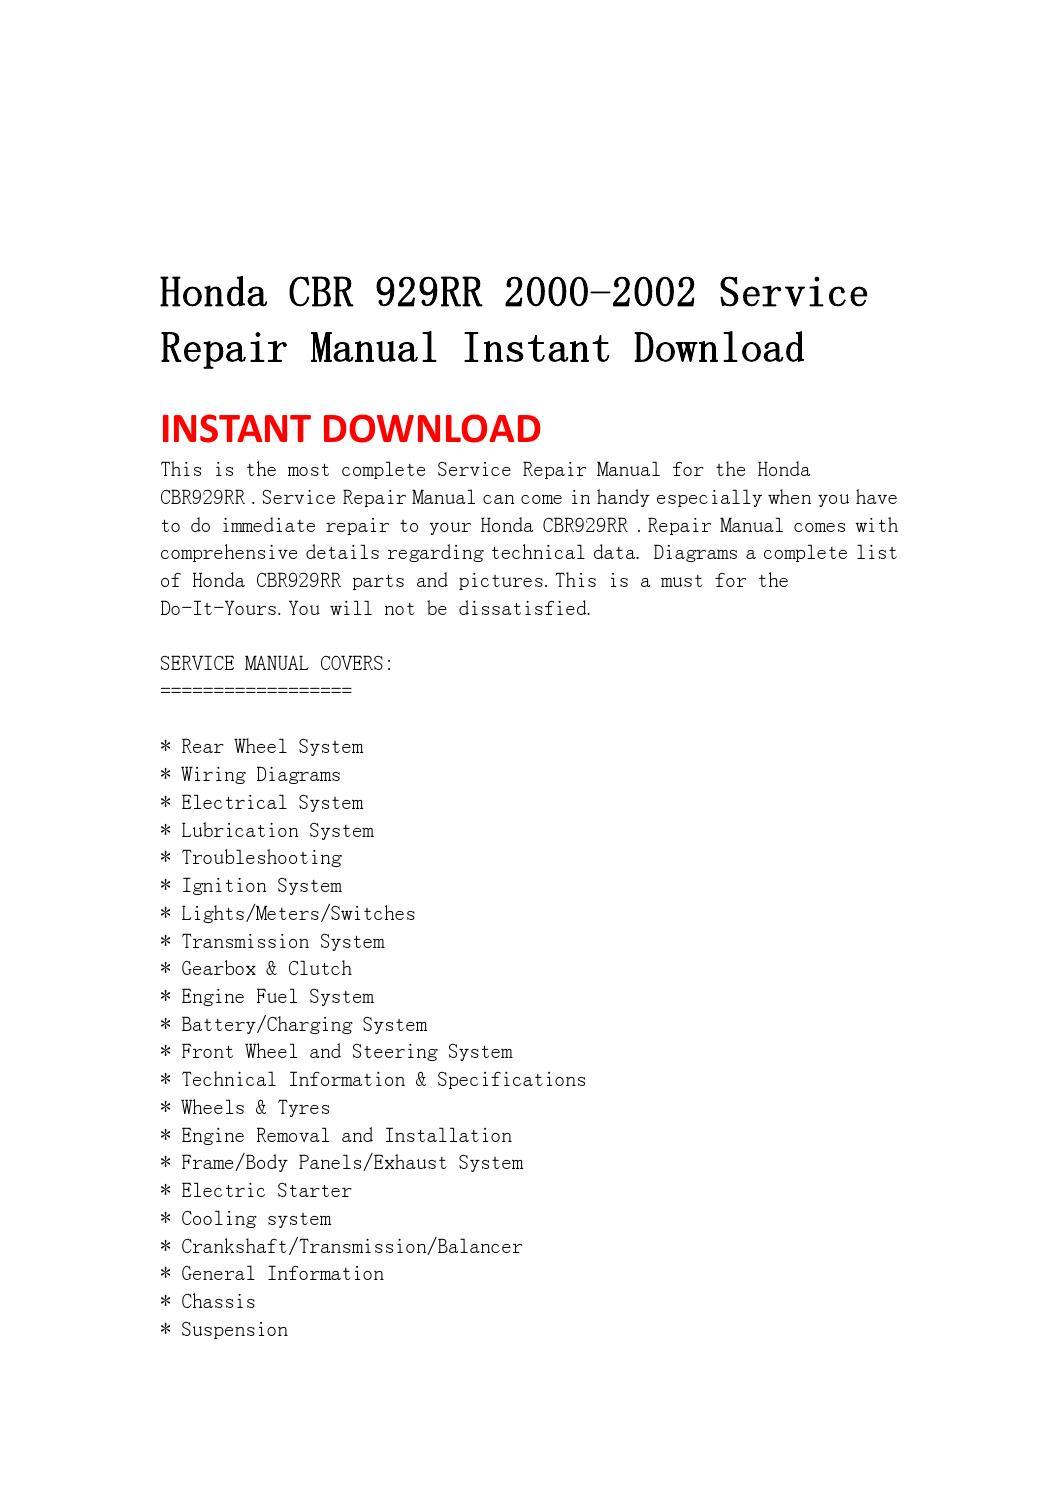 hight resolution of honda cbr 929rr 2000 2002 service repair manual instant download by fdhgsbefhnn issuu